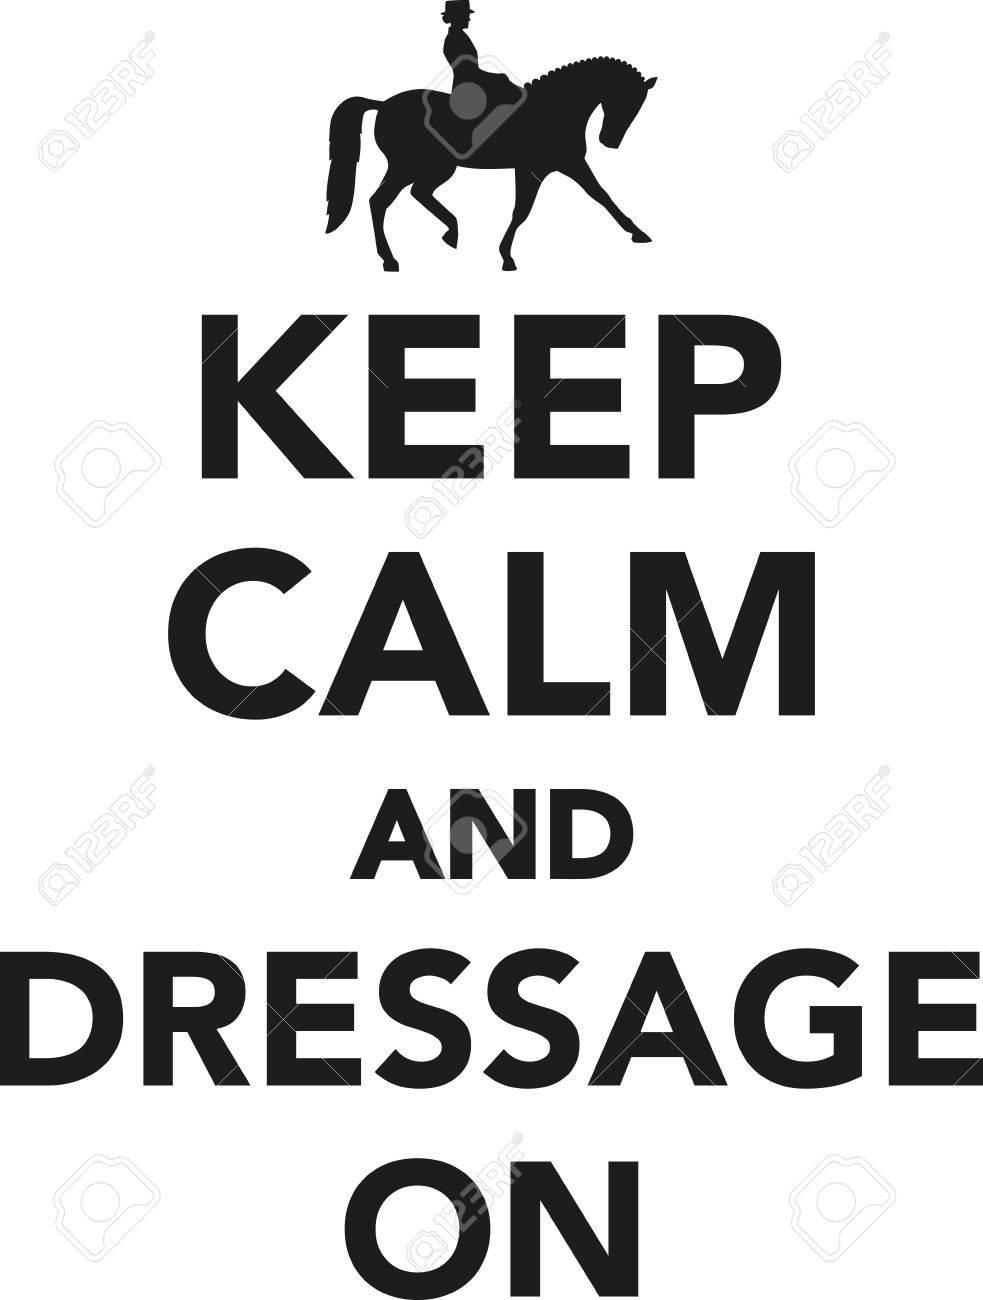 keep calm and dressage on royalty free cliparts vectors and stock rh 123rf com keep calm vector template keep calm vectorial